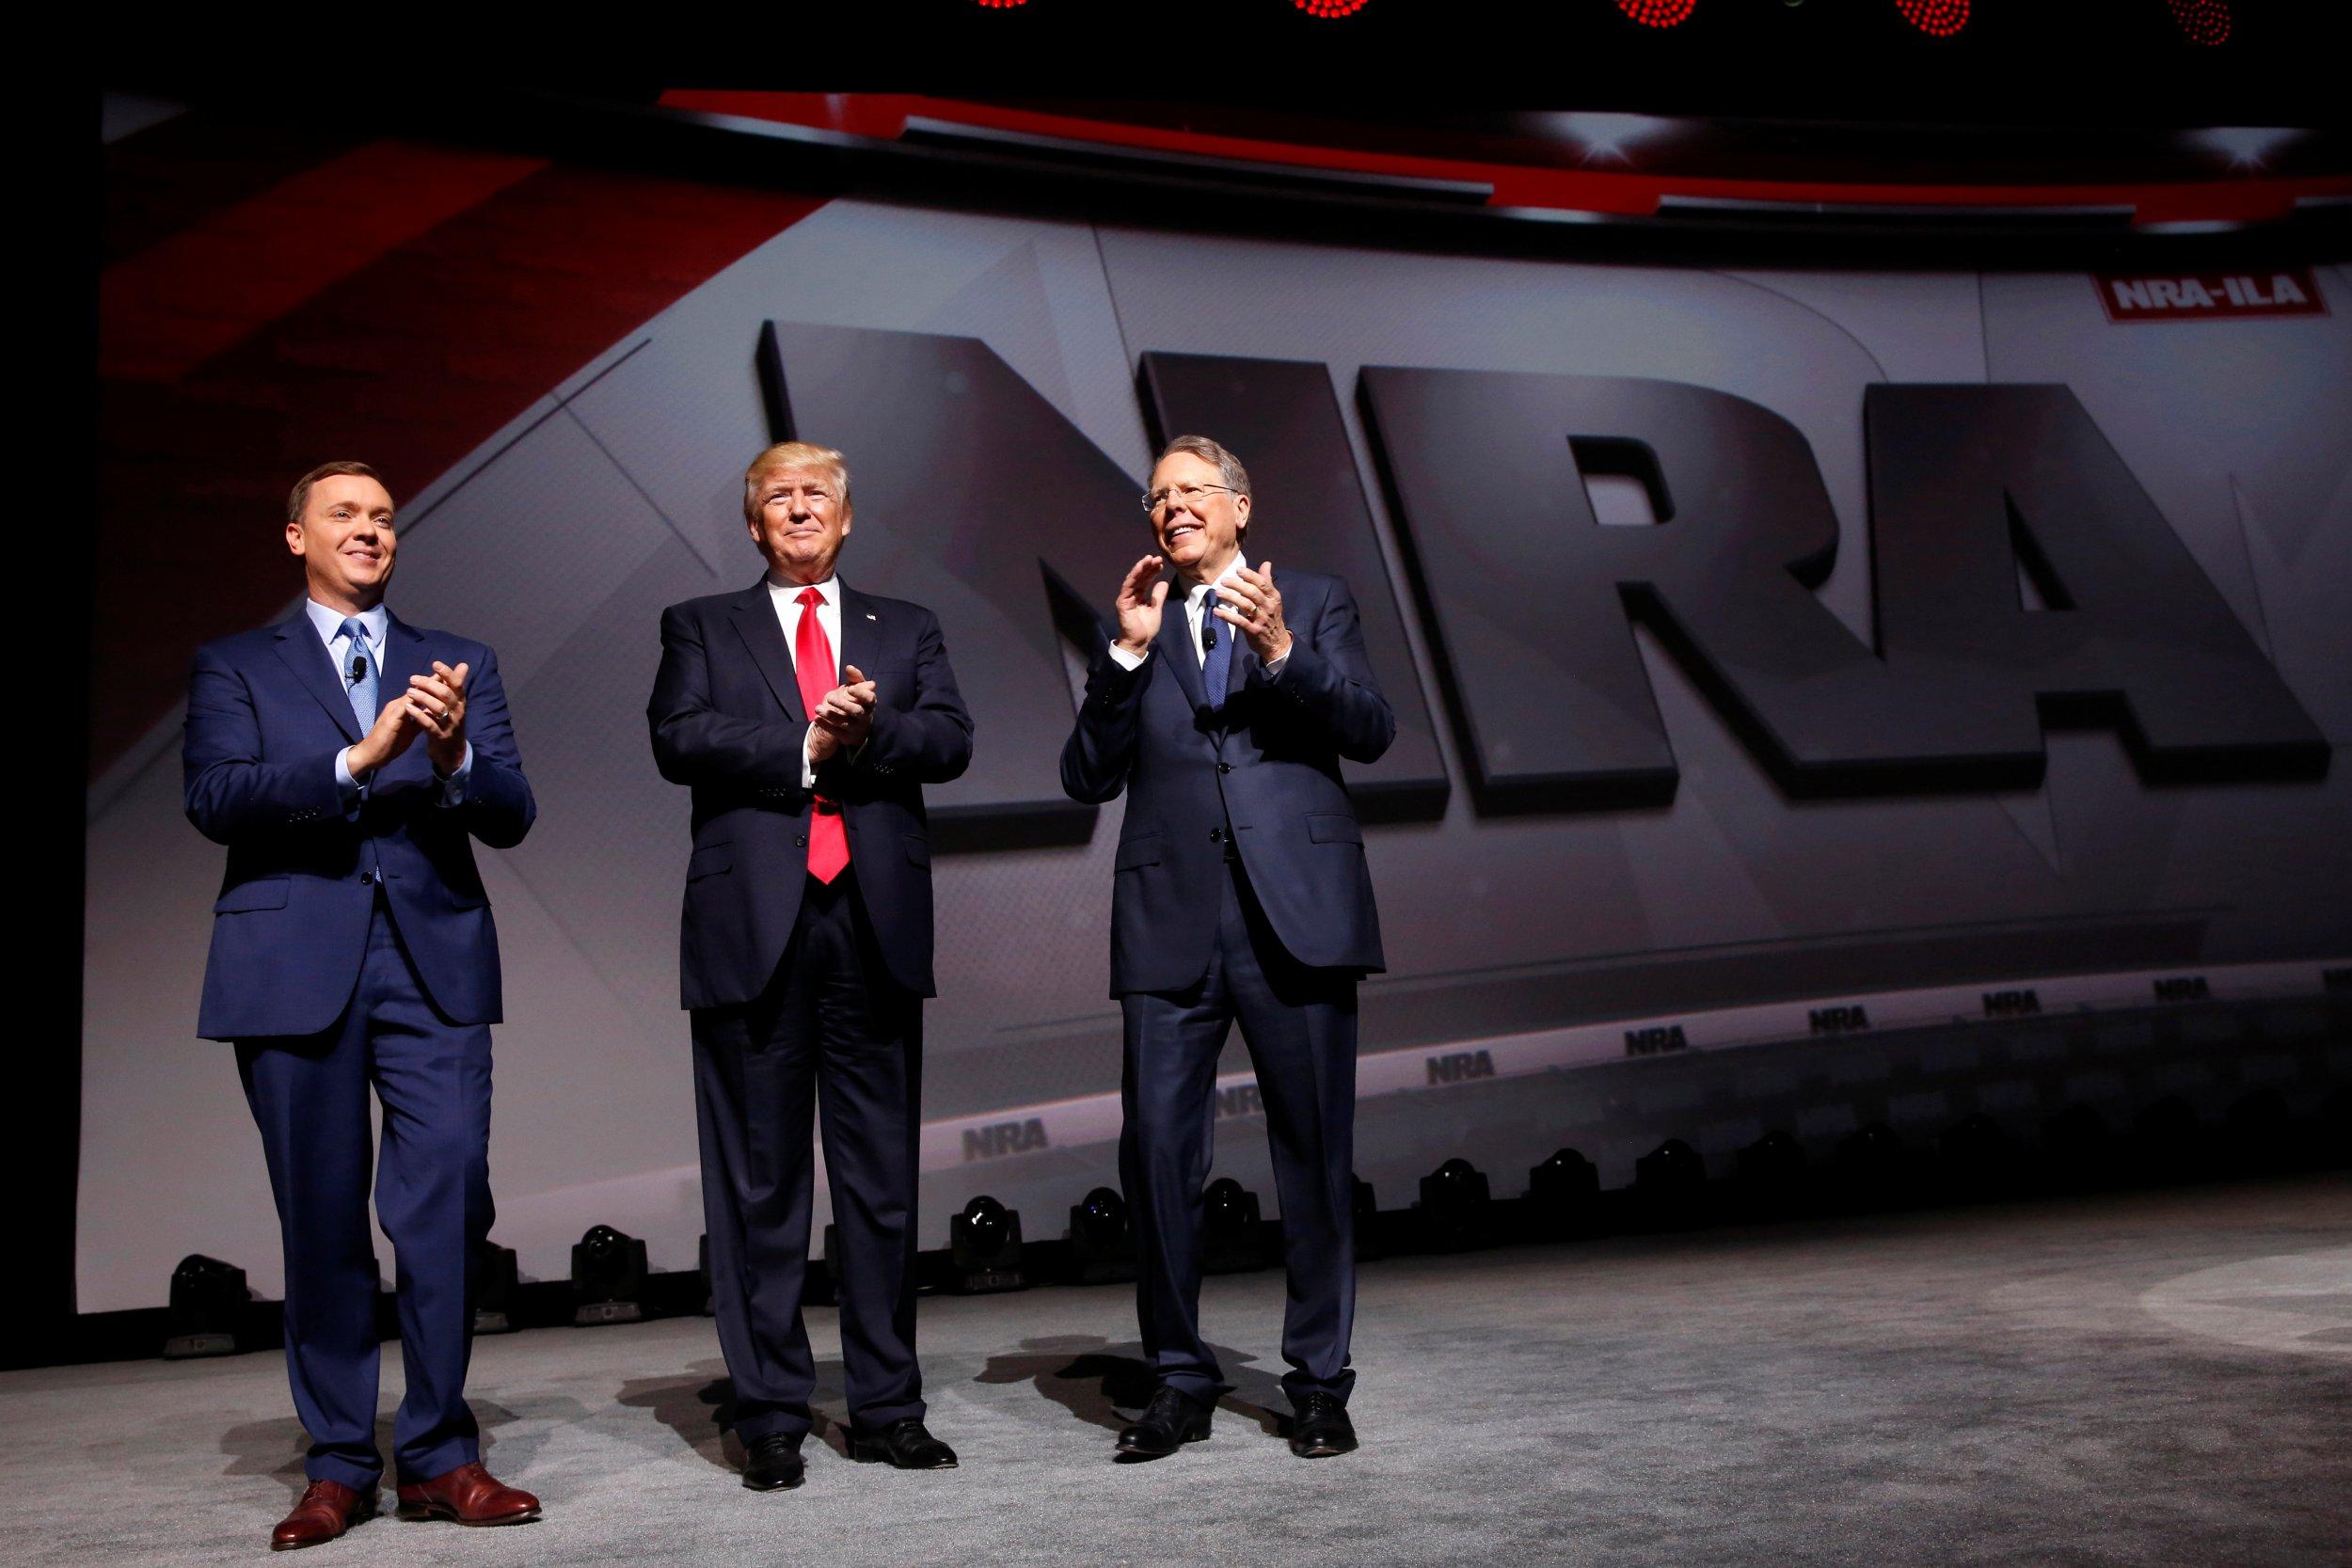 10_04_Trump_NRA